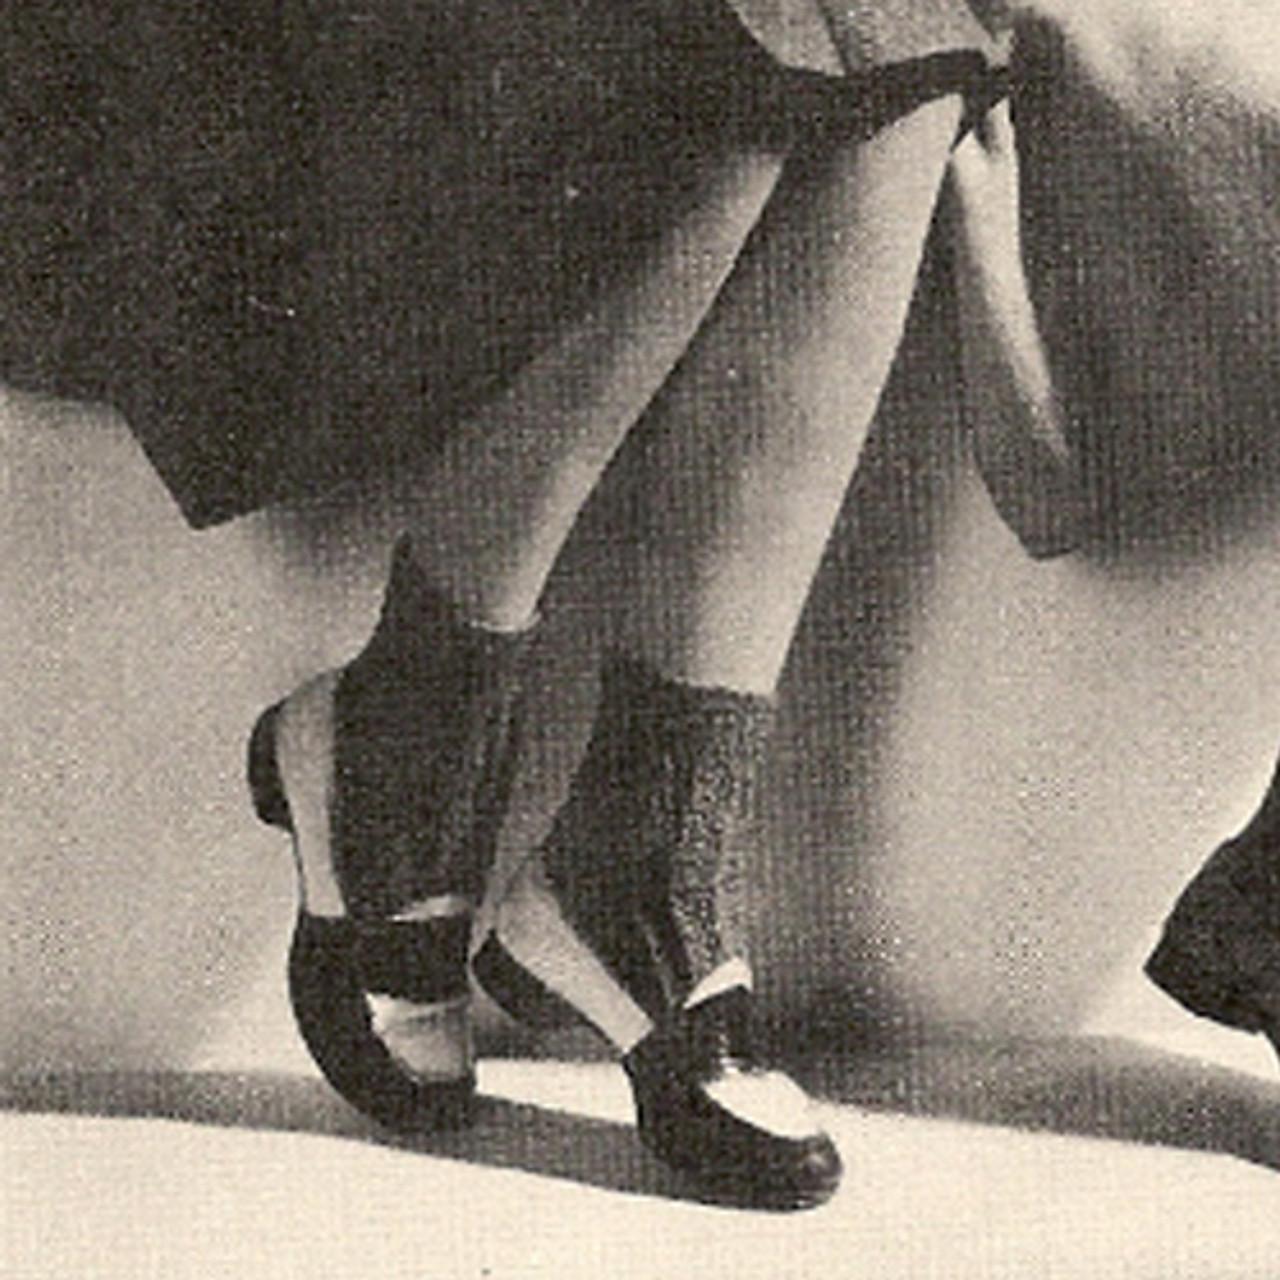 Vintage Knitted Ankle Length Socks Pattern